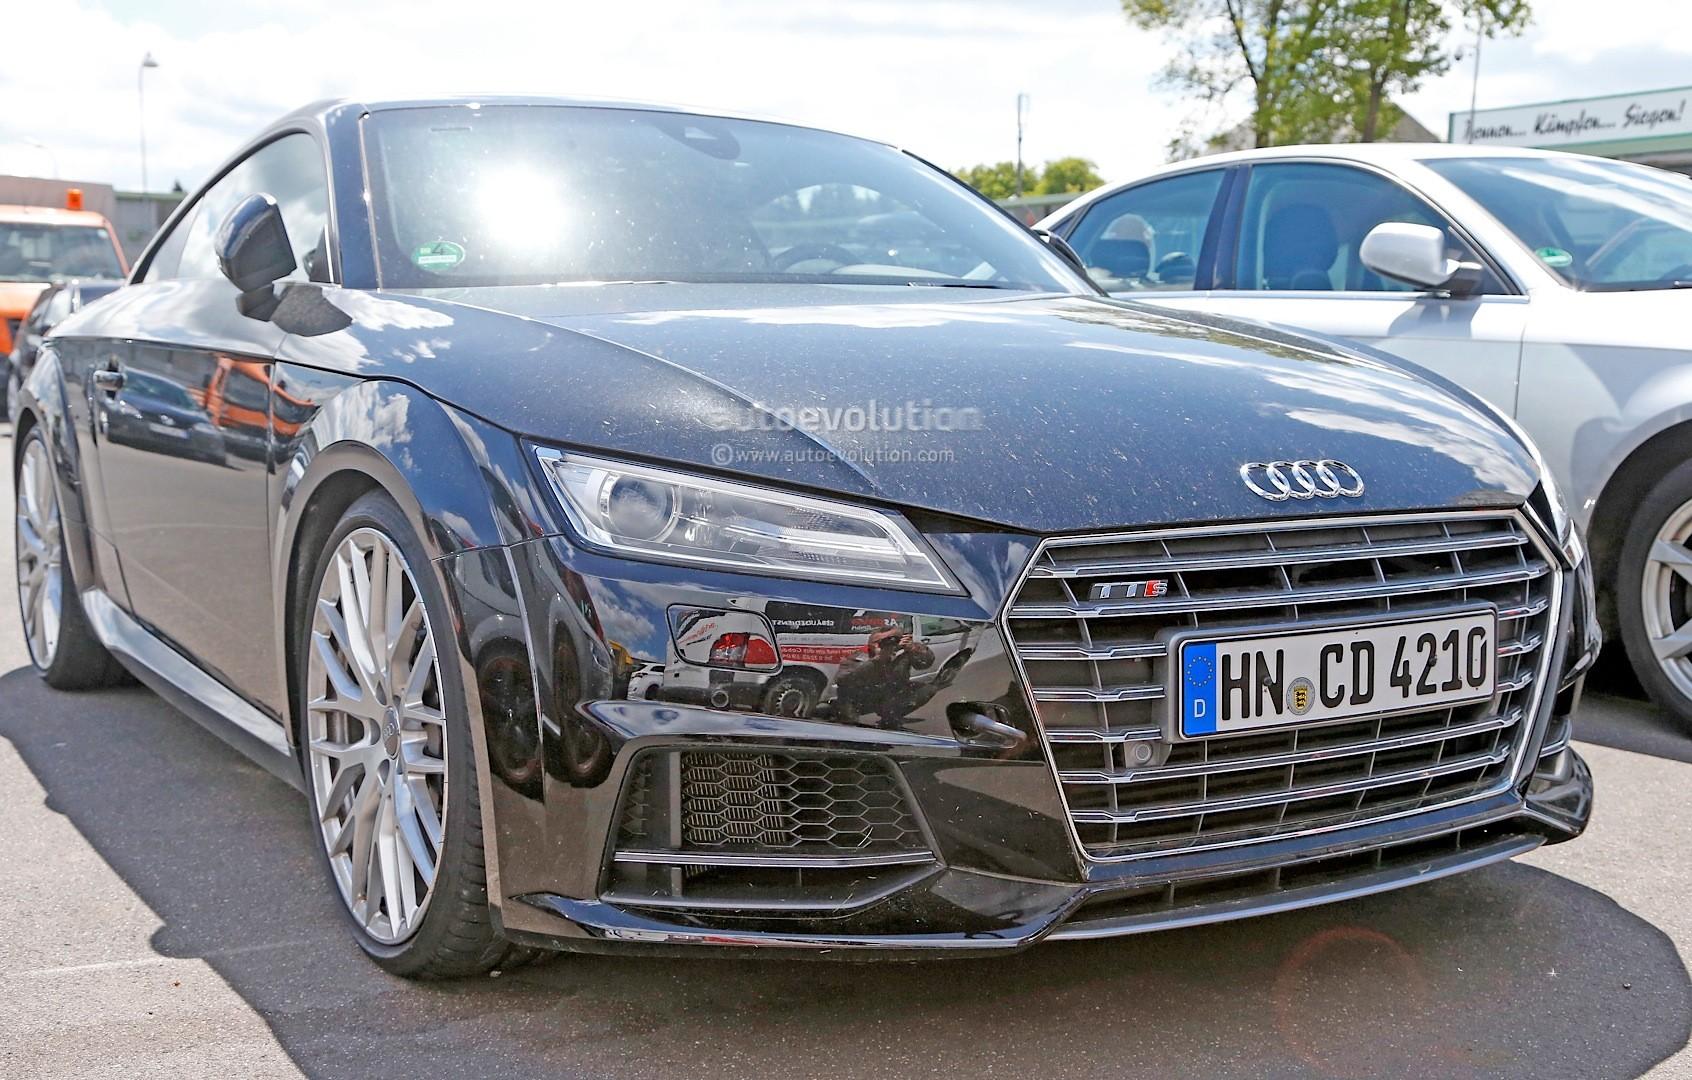 Spyshots: 2016 Audi TT-RS Hides True Performance Potential ... on 2014 audi tt black, 2016 chevrolet colorado black, 2016 audi tt colors, audi a6 black, 2016 ford rs black, 2016 audi q7, 2016 camaro rs black, 2016 lexus ls black,